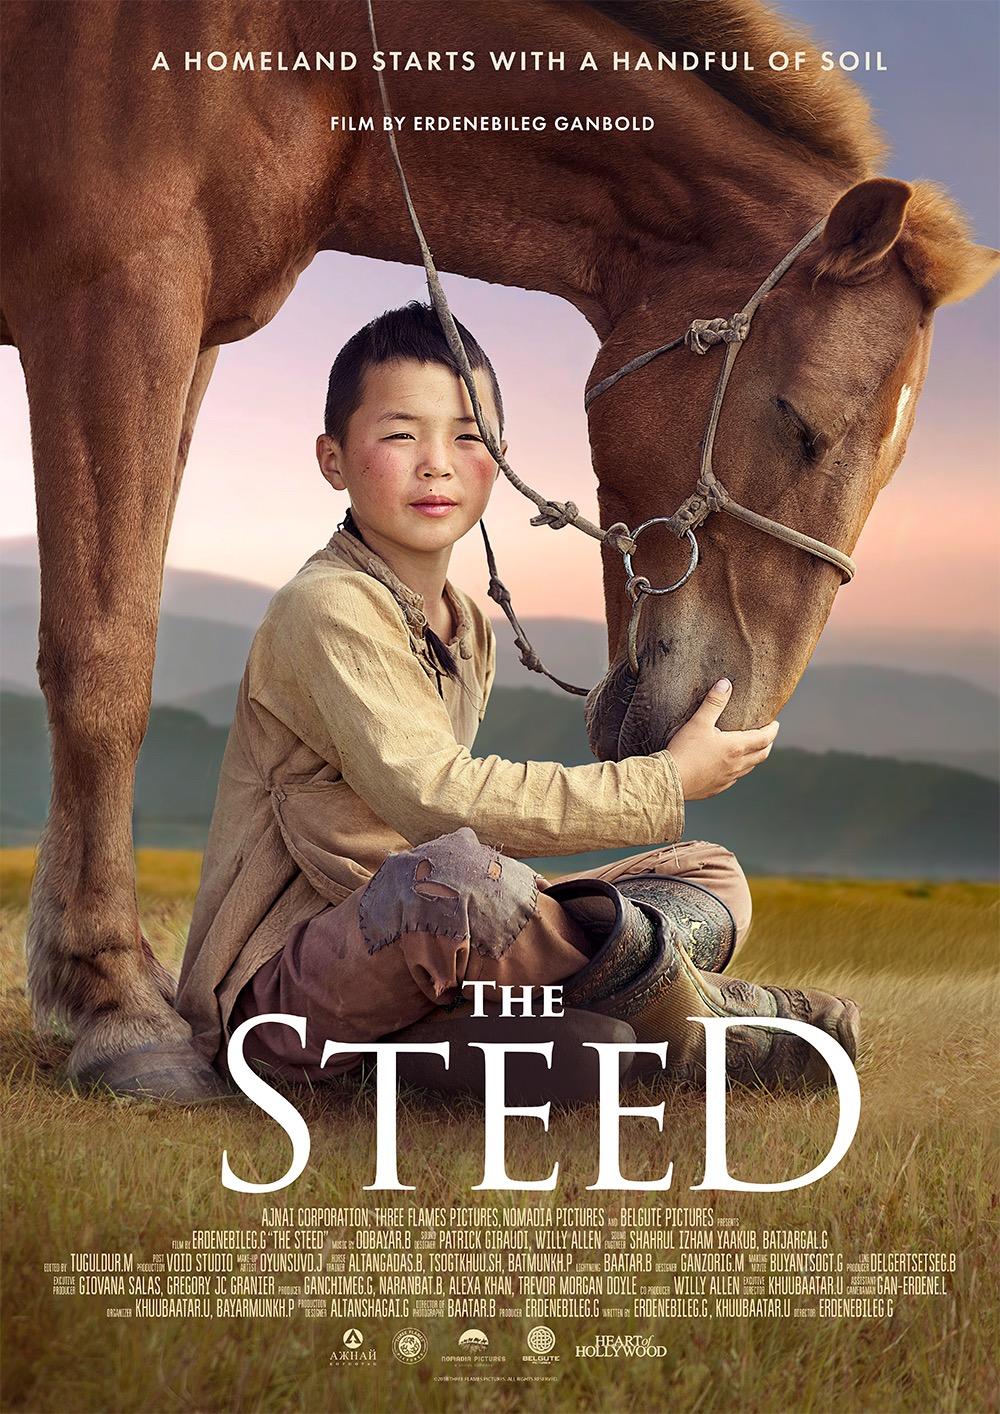 The Steed kapak